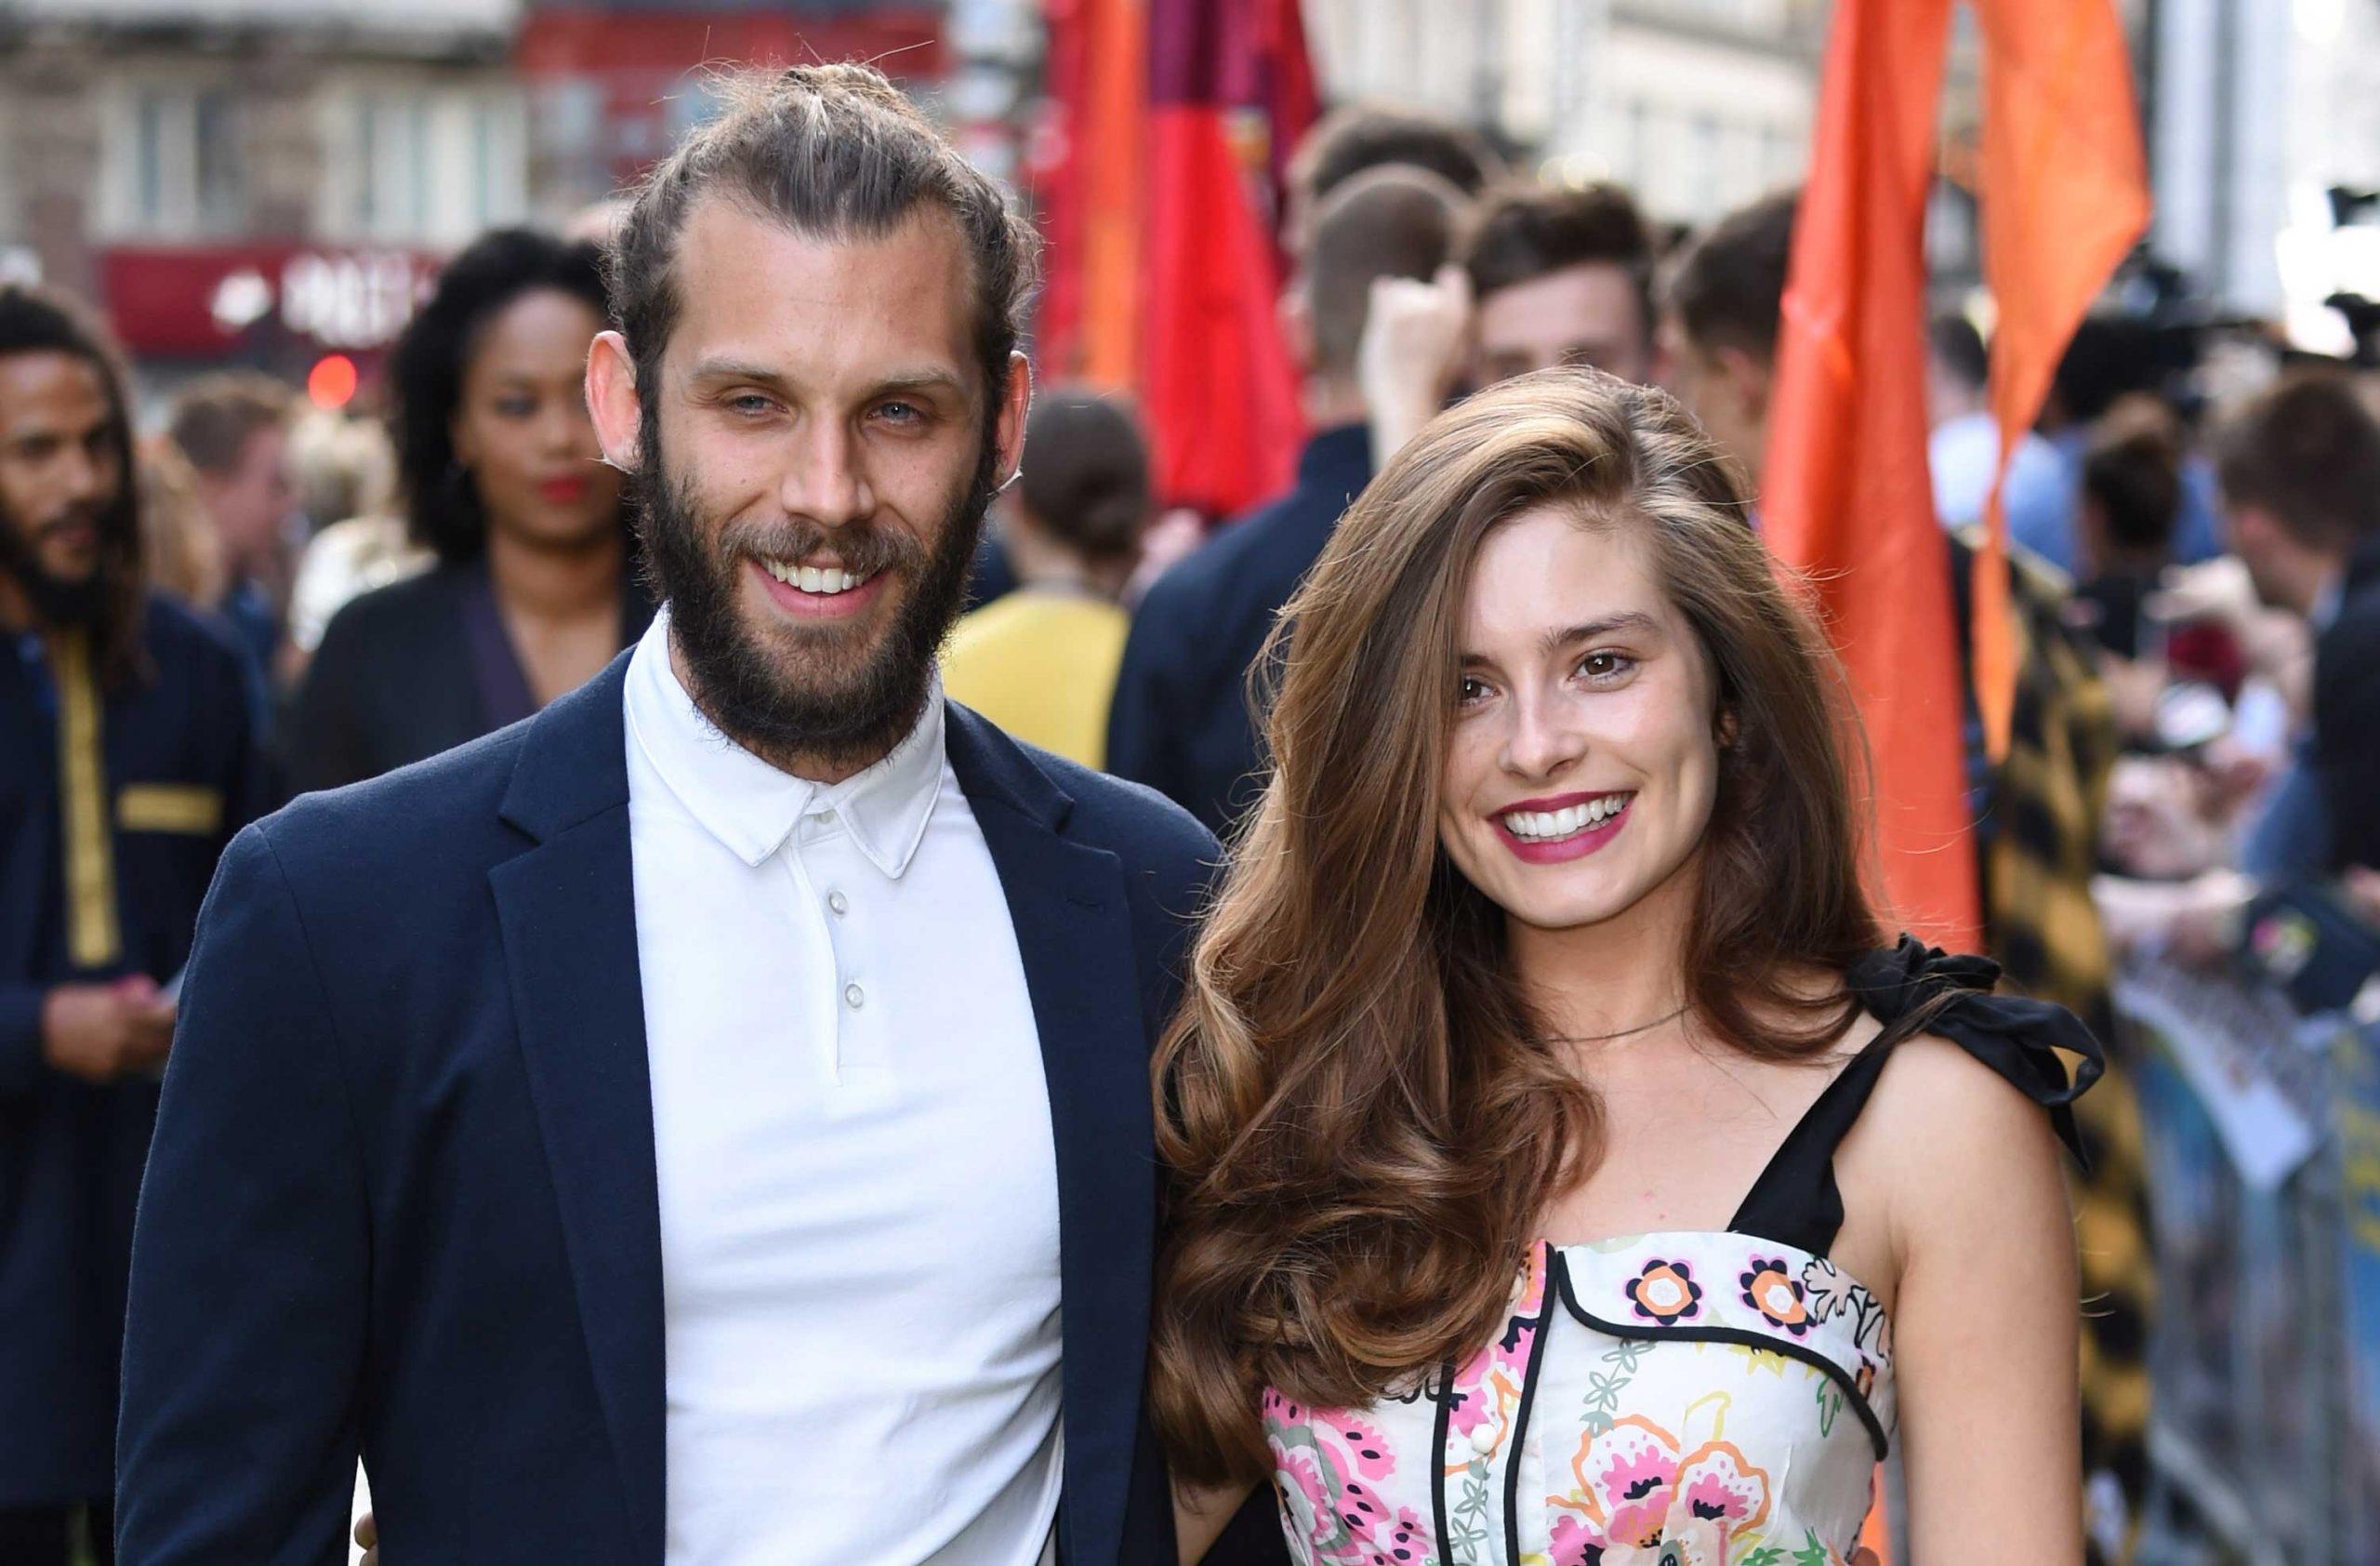 Chris Overton and Rachel Shenton